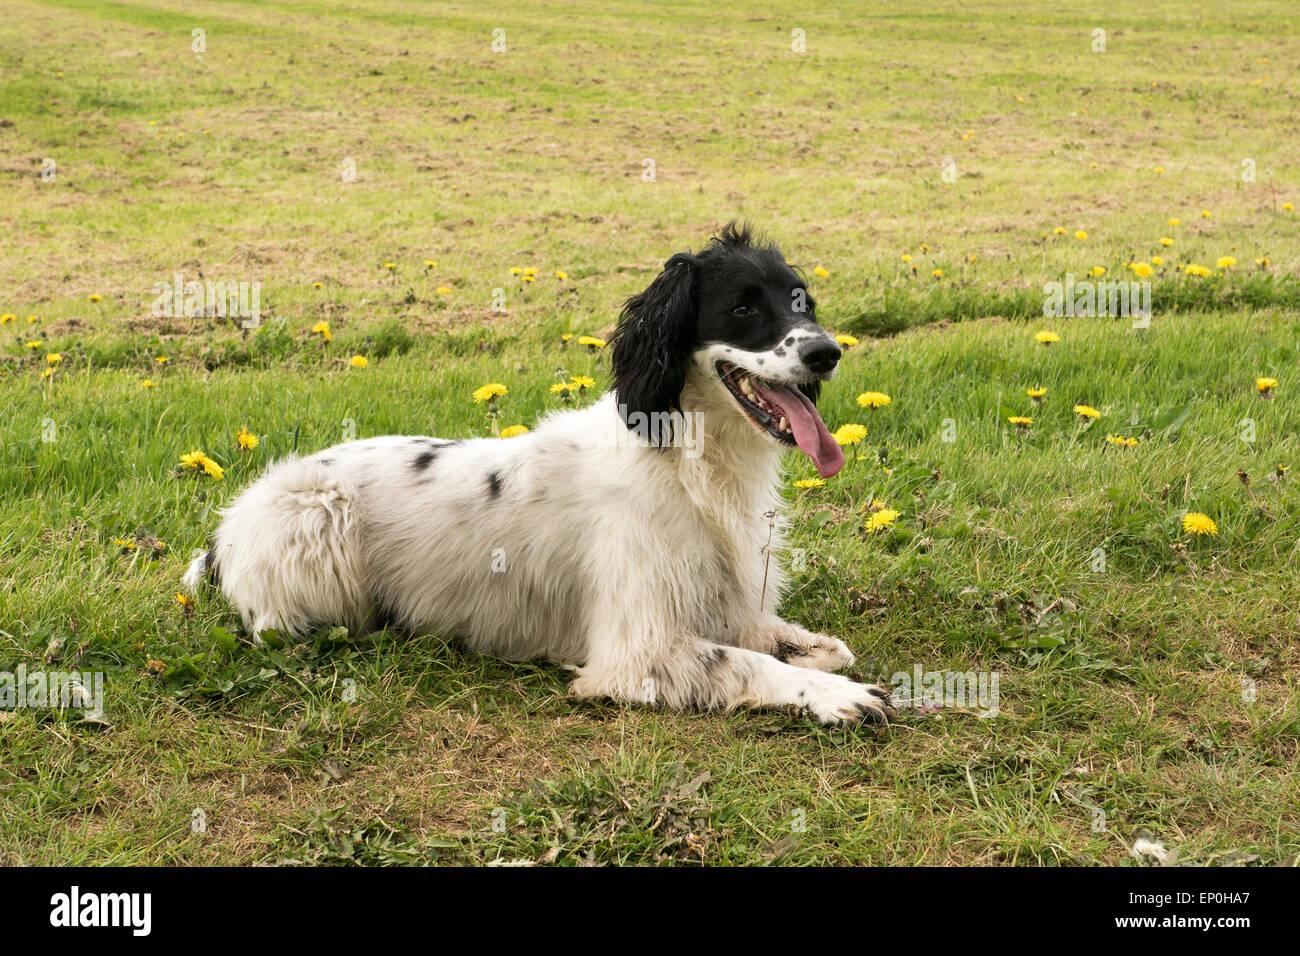 panting Springer Spaniel. - Stock Image